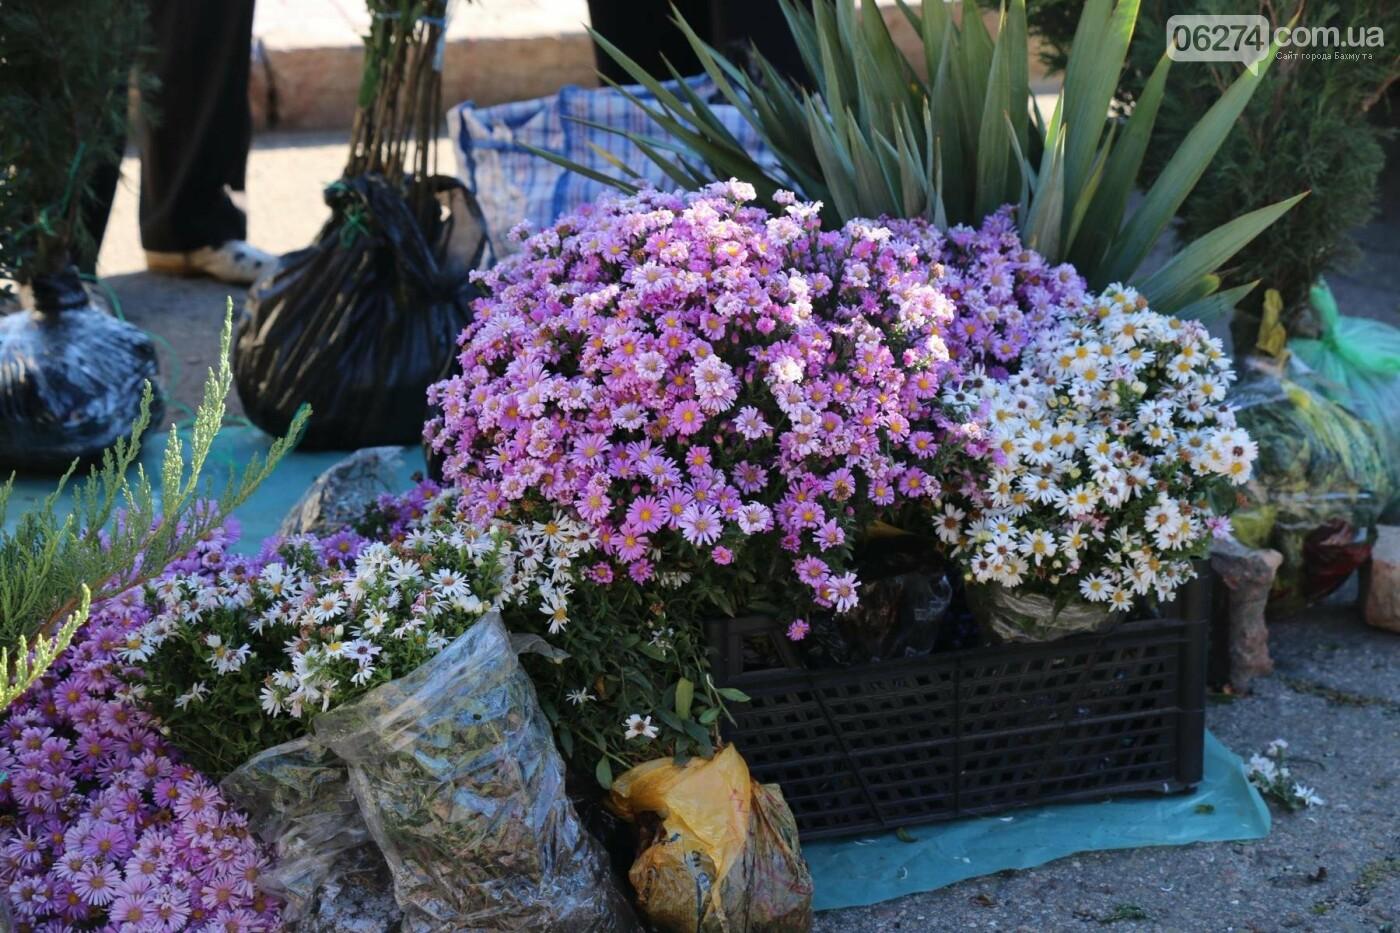 В Бахмуте прошла ярмарка «День садовода» (ФОТО), фото-16